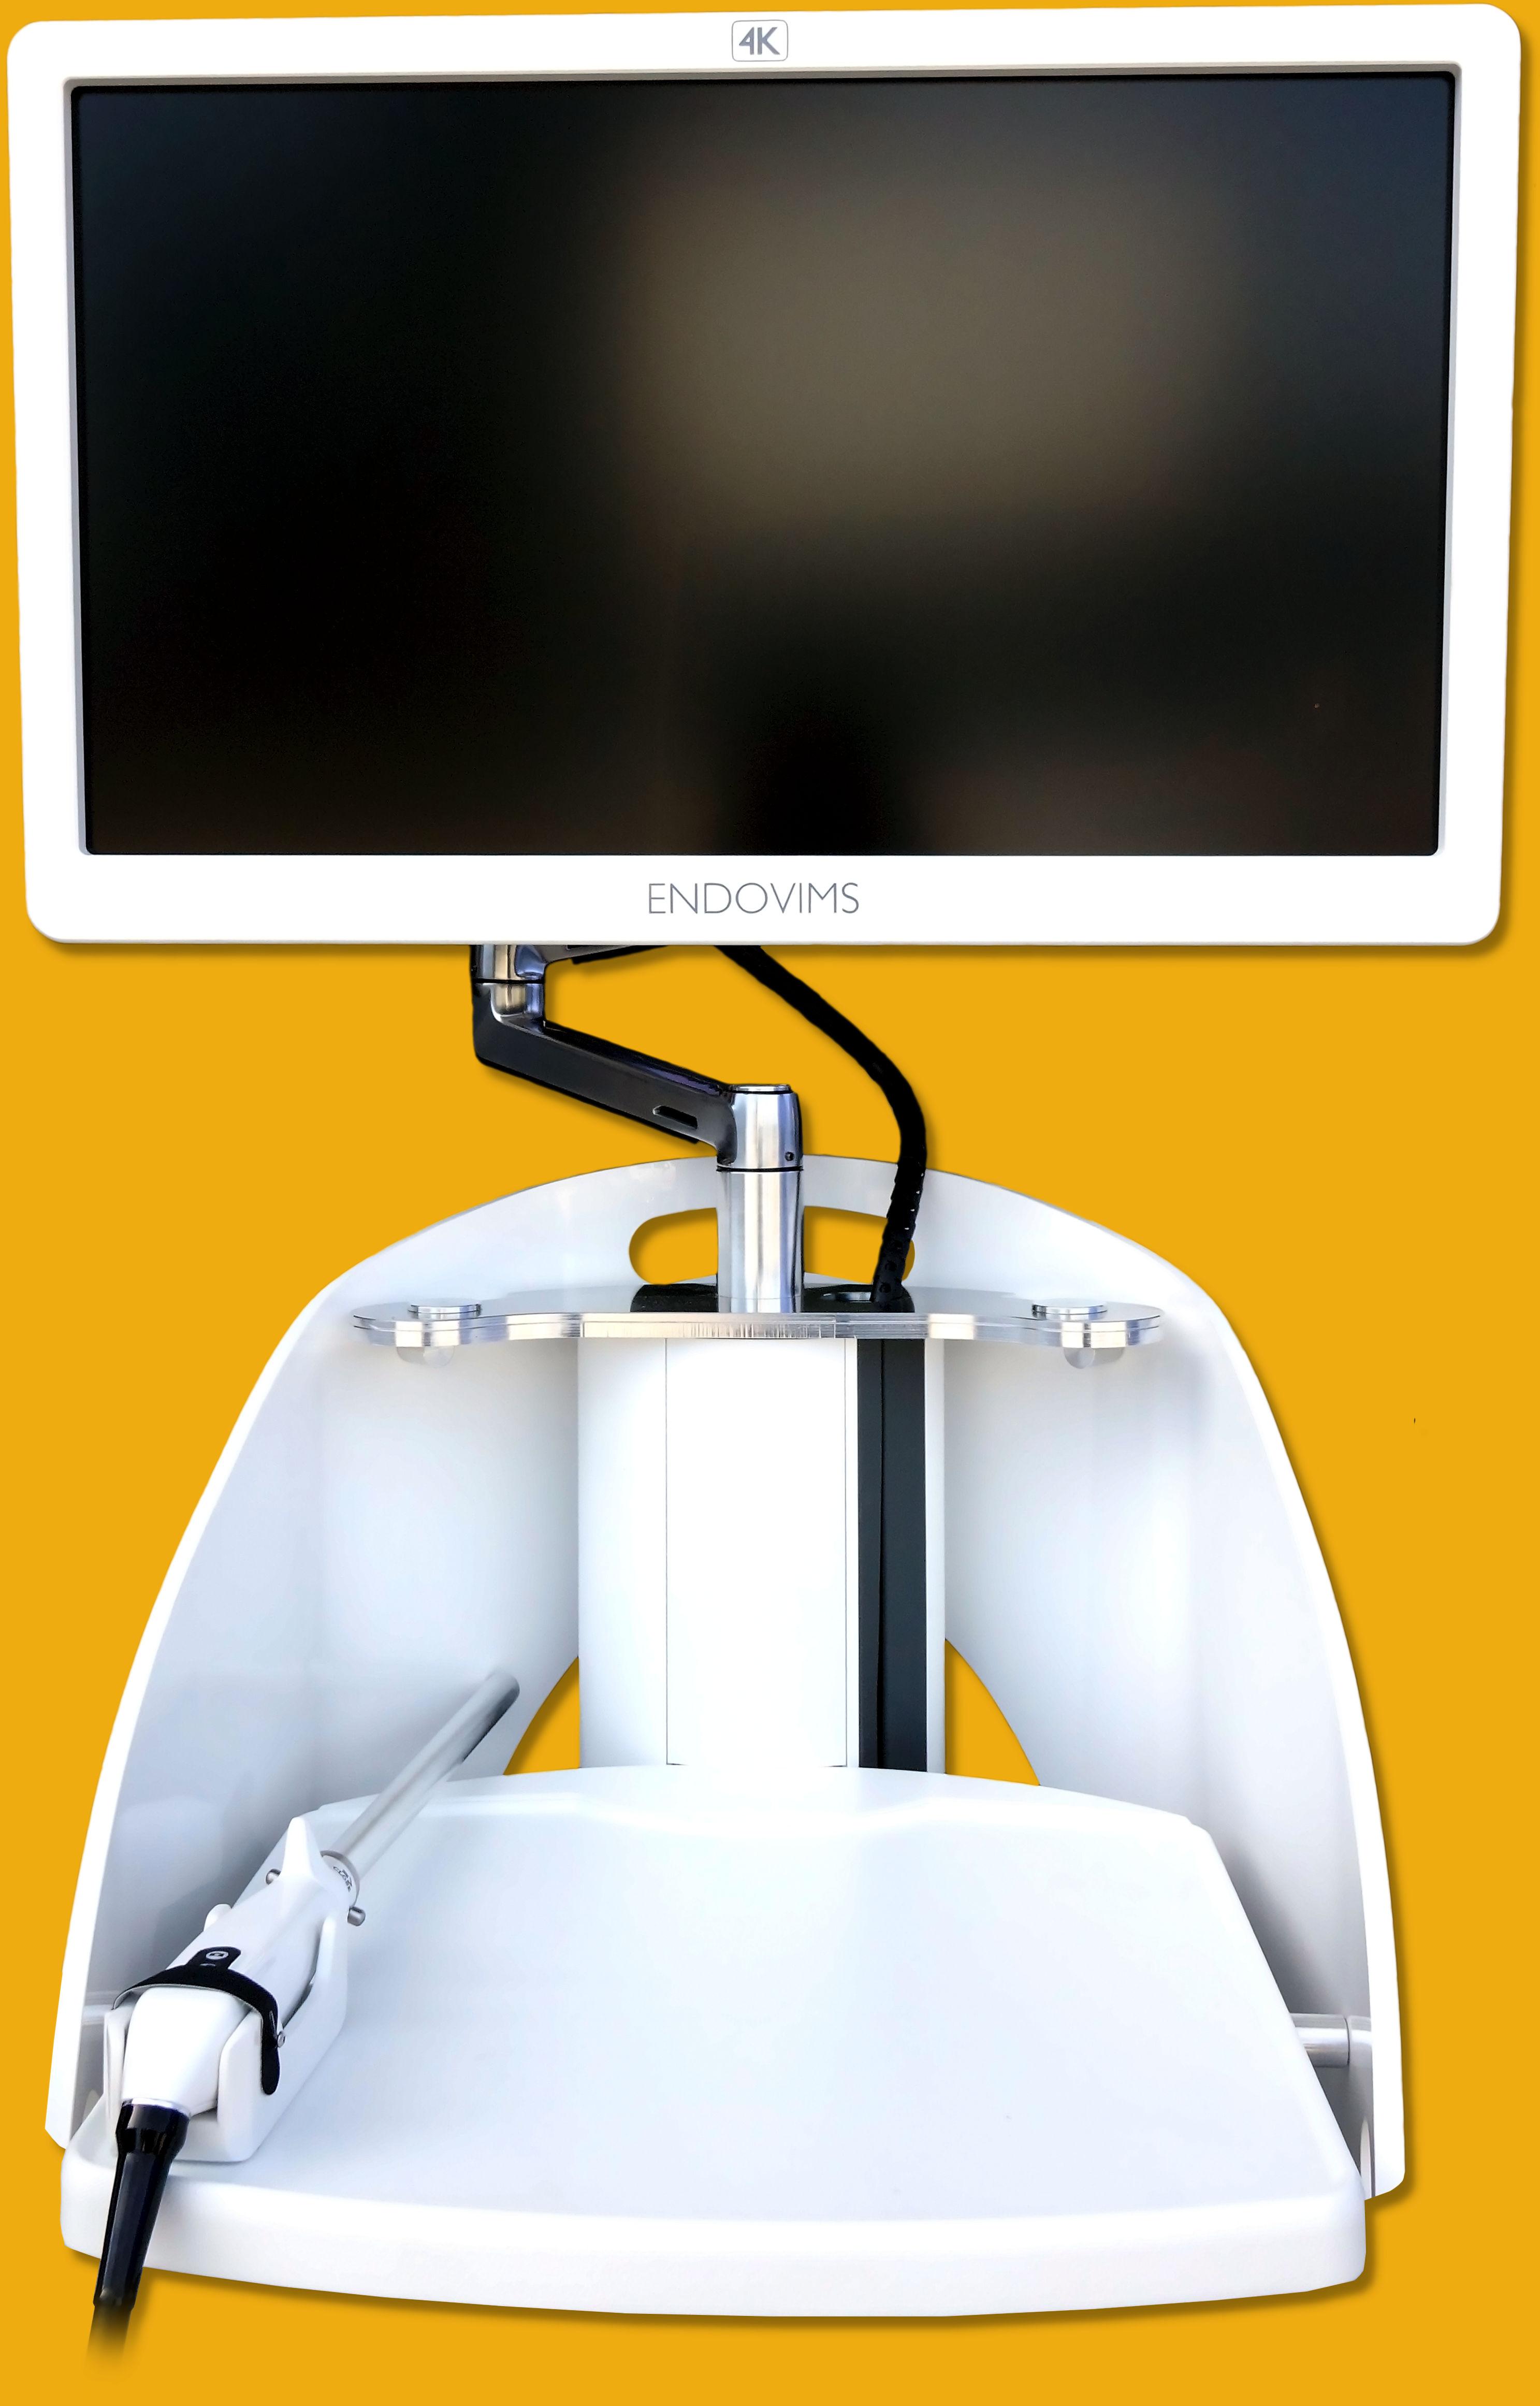 EndoVims 4K - Laparoscopy